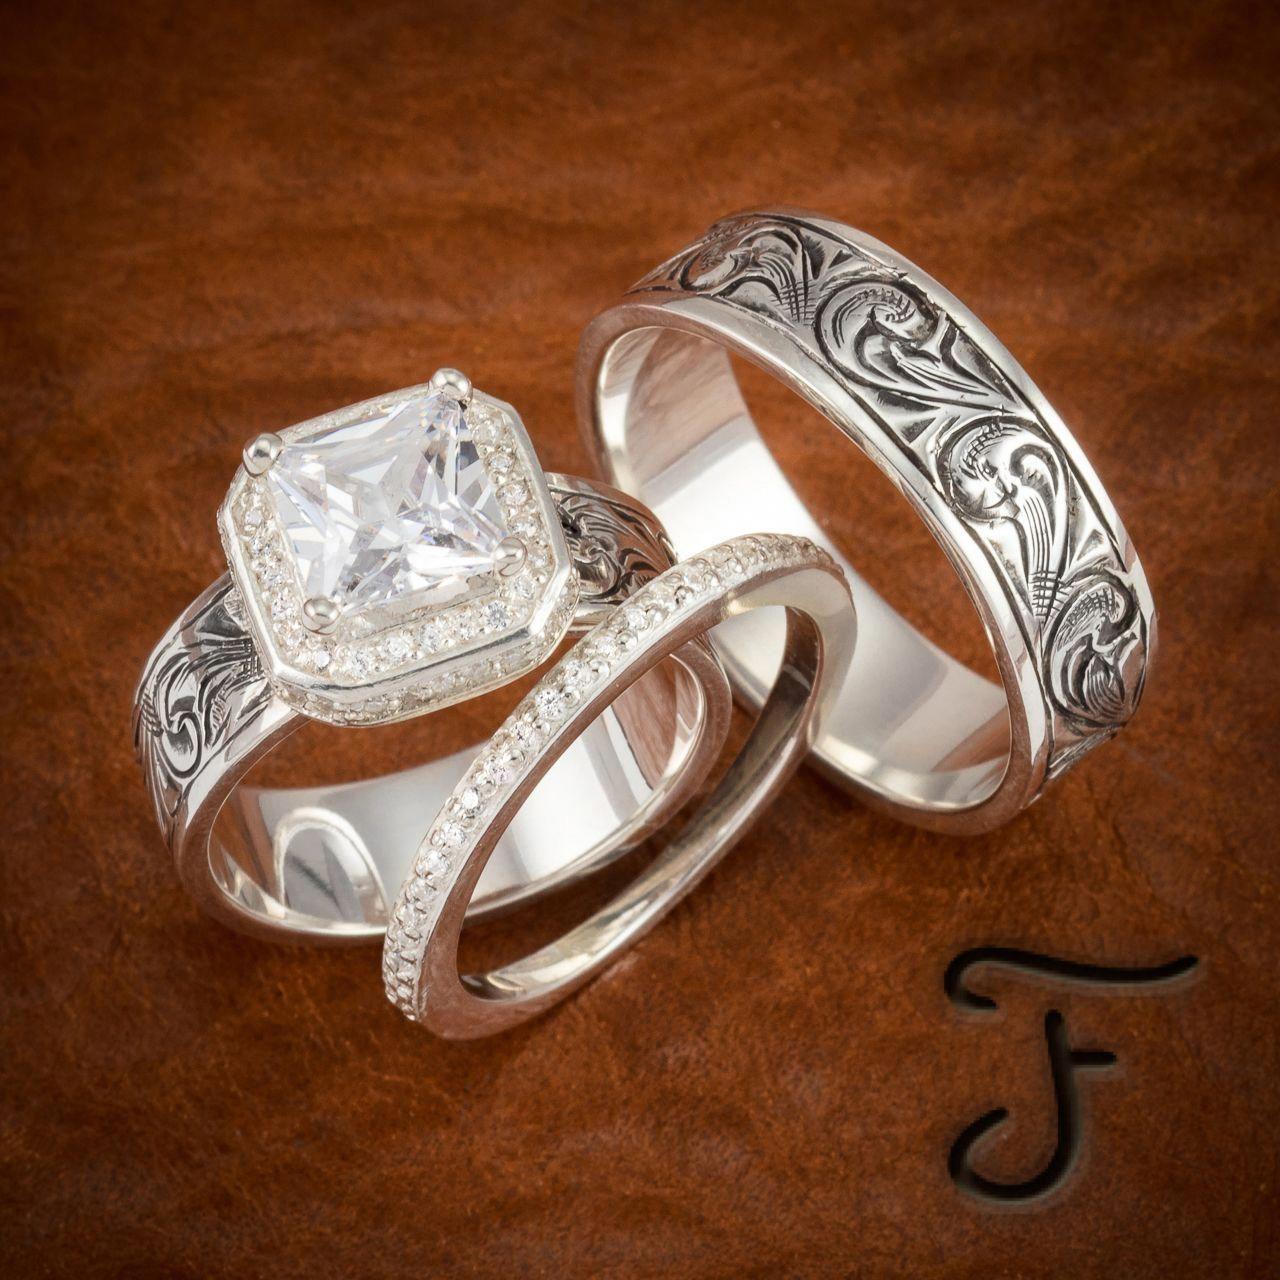 Special ReservedUnique Moissanite Engagement Ring 14K